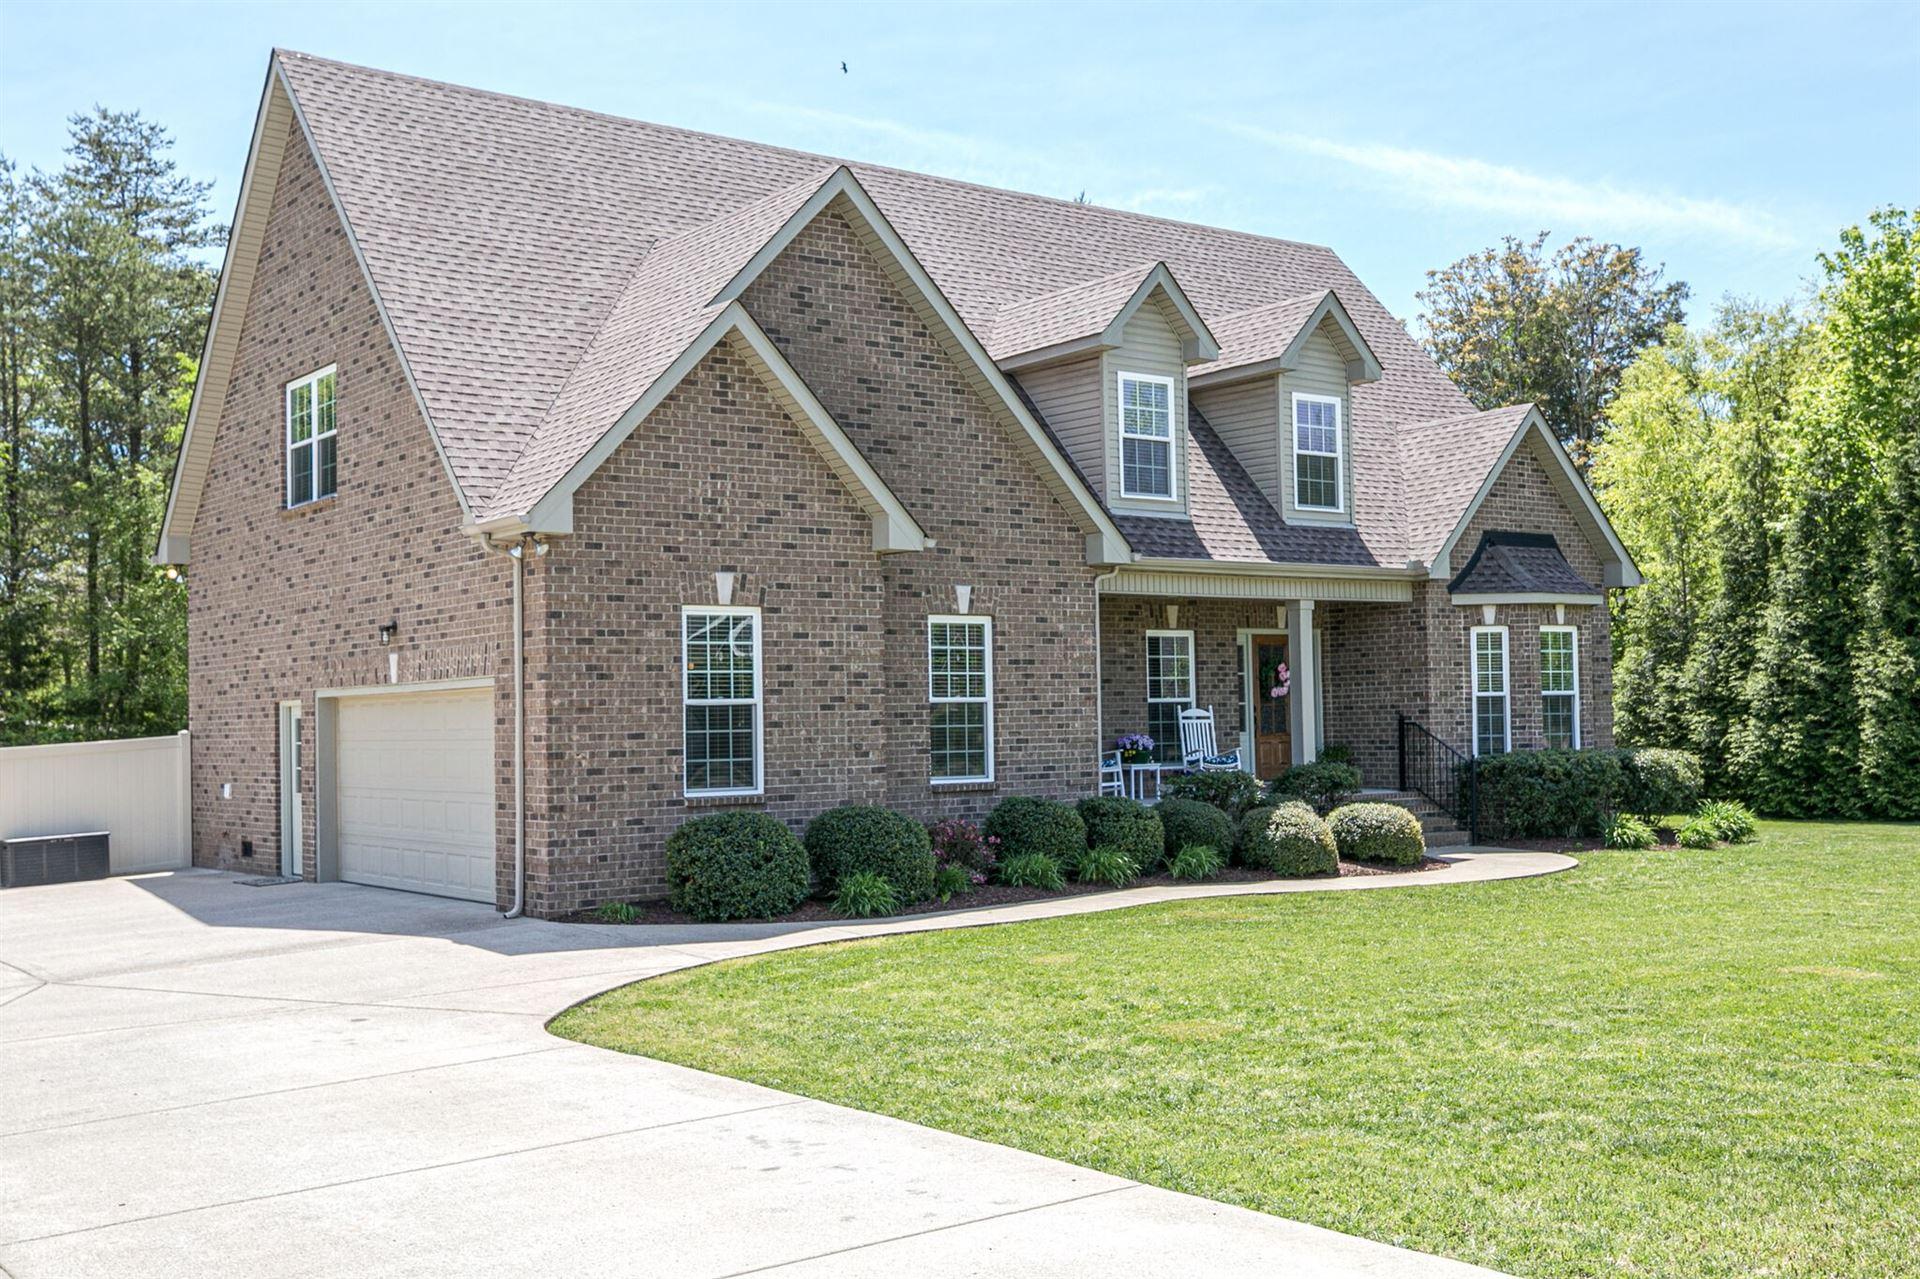 Photo of 508 Serviceberry Dr, Murfreesboro, TN 37128 (MLS # 2251441)